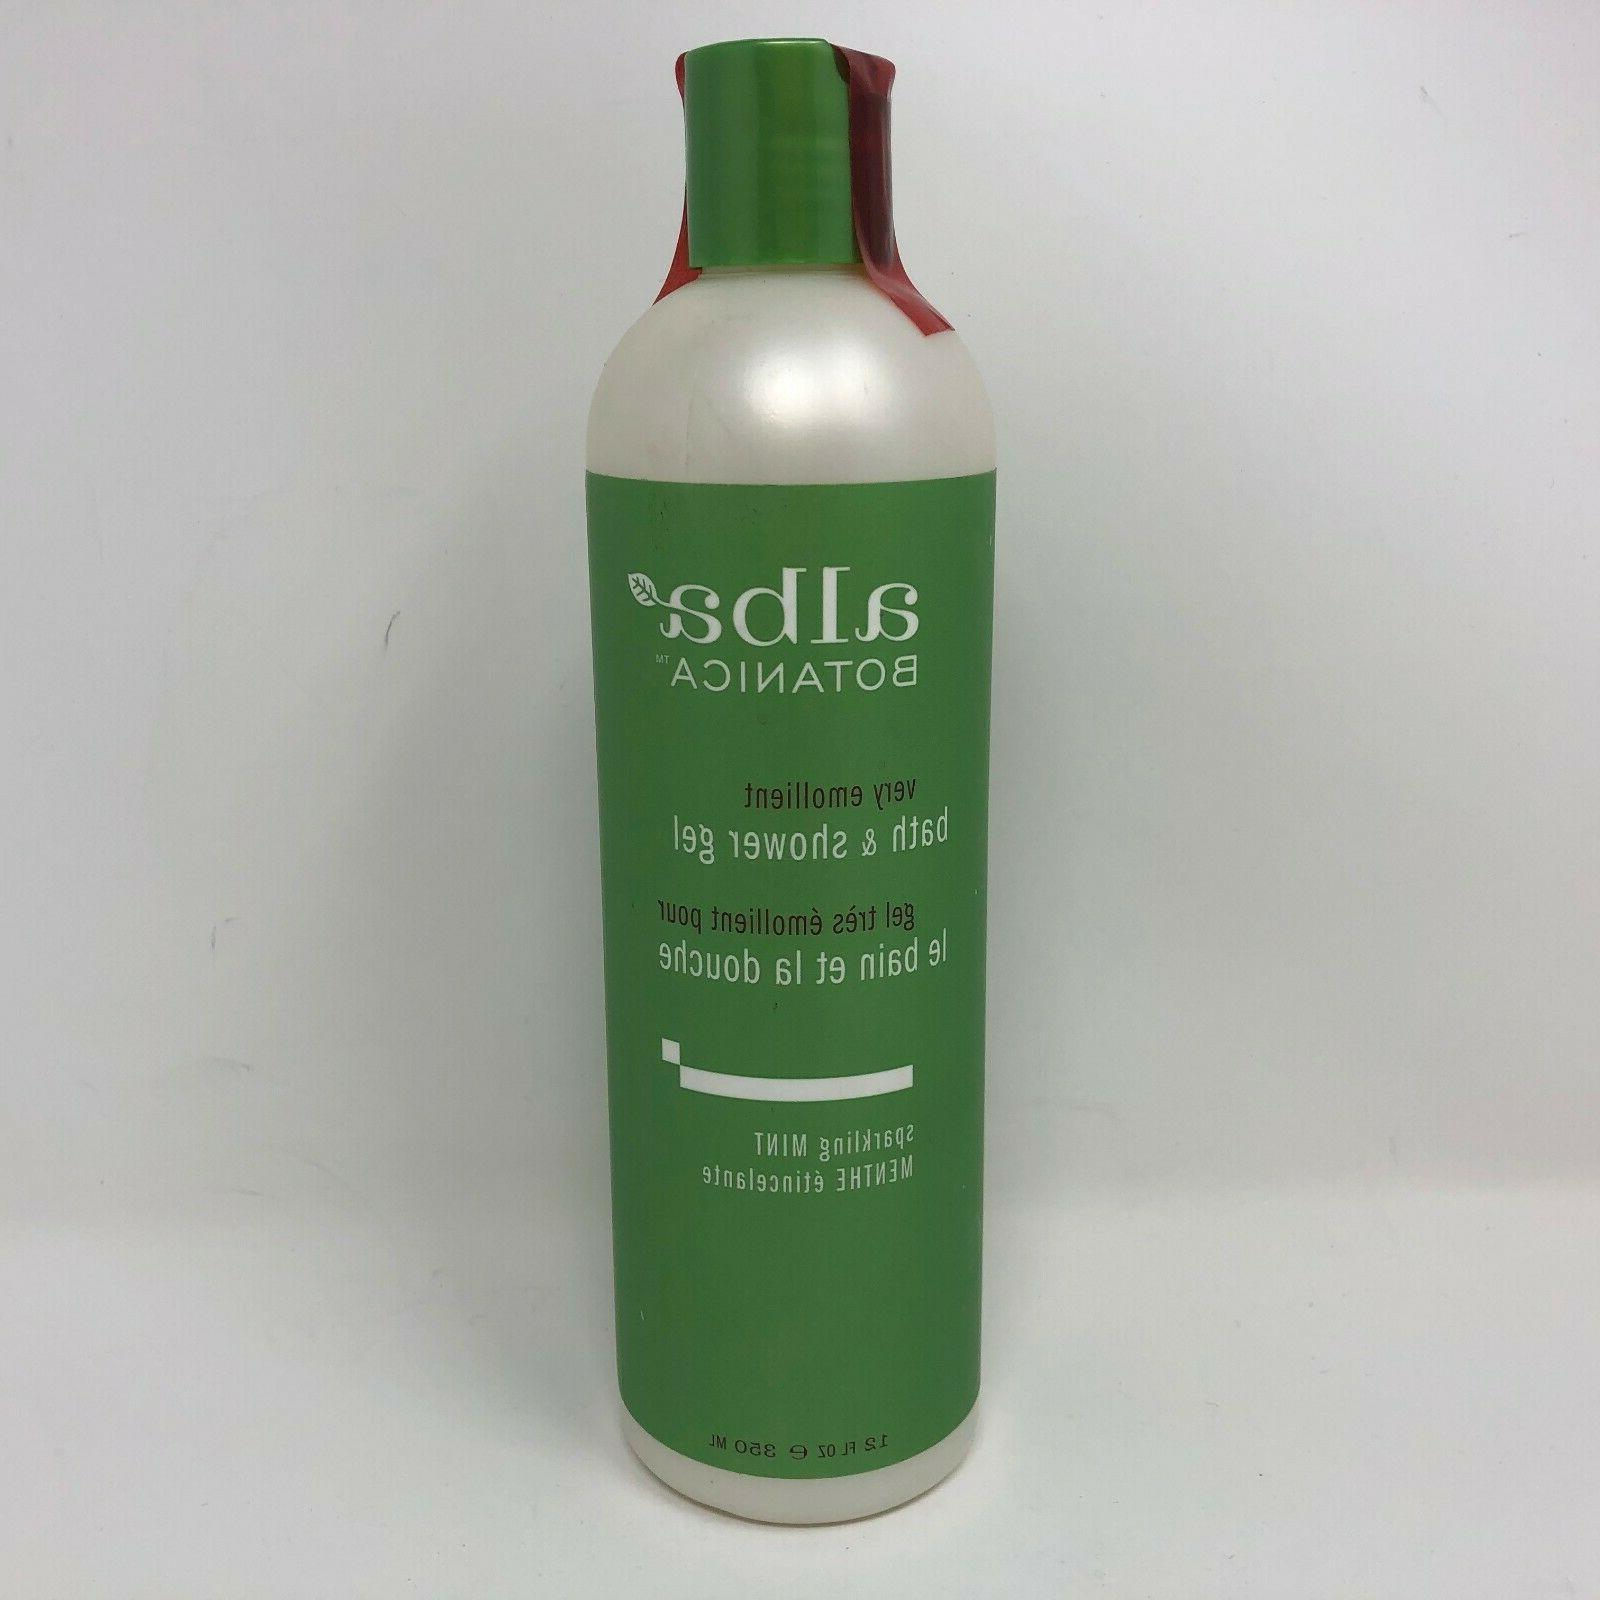 Alba Botanica Bath and Shower Gel, Sparkling Mint - 1 x 32 O